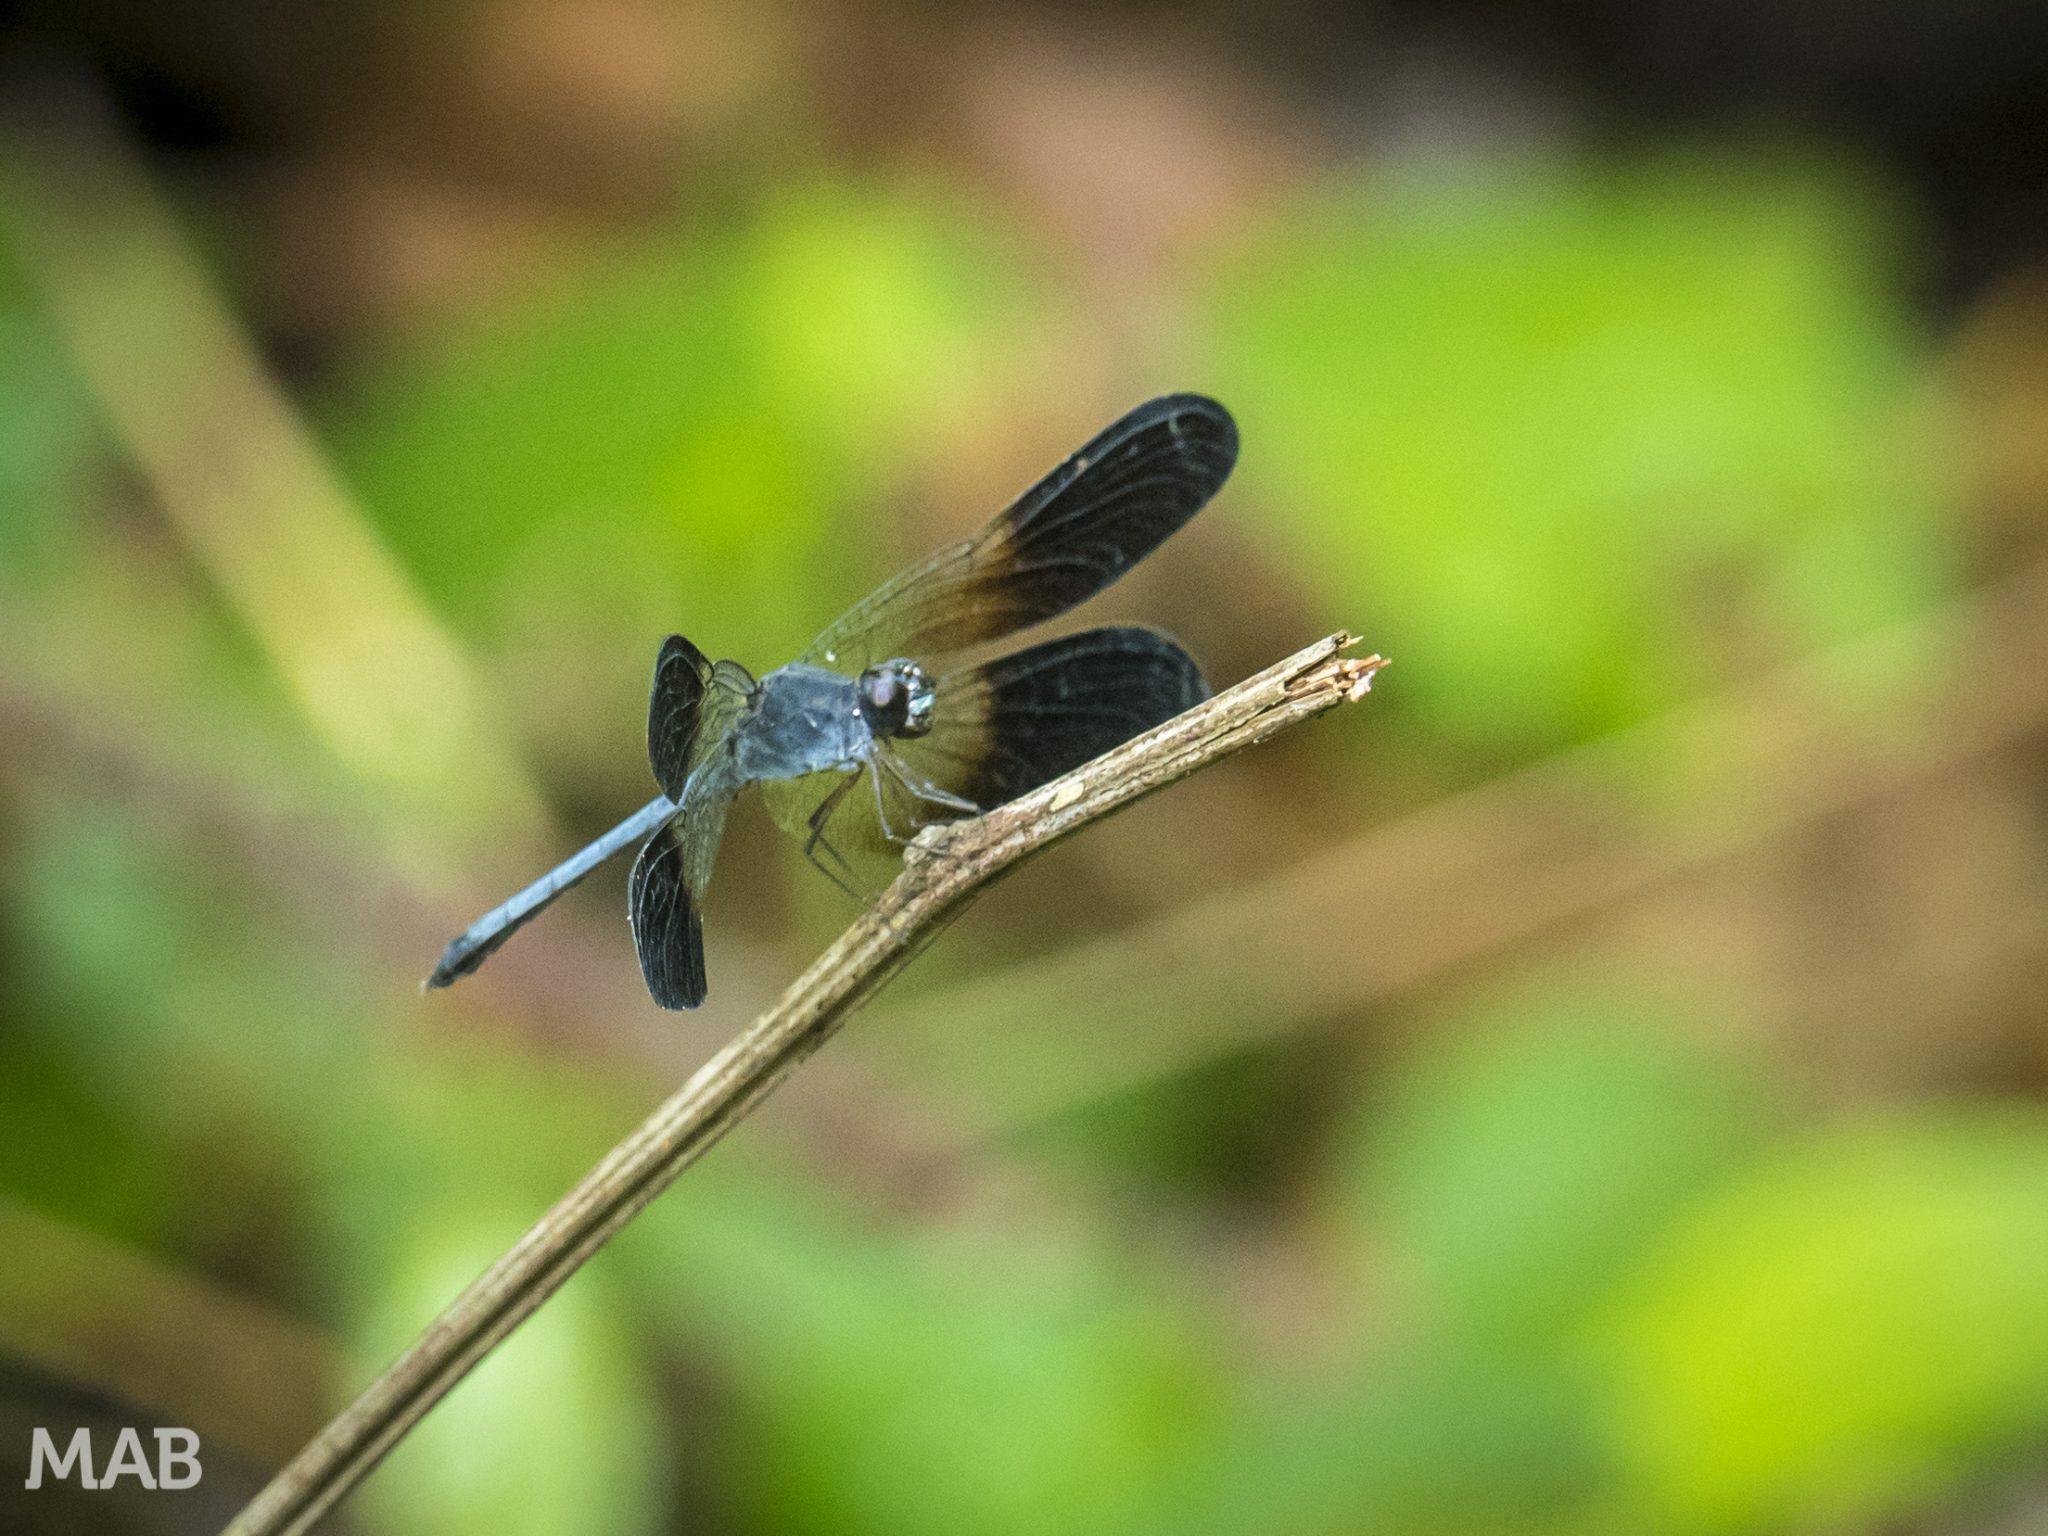 Lots of Dragonflies 1